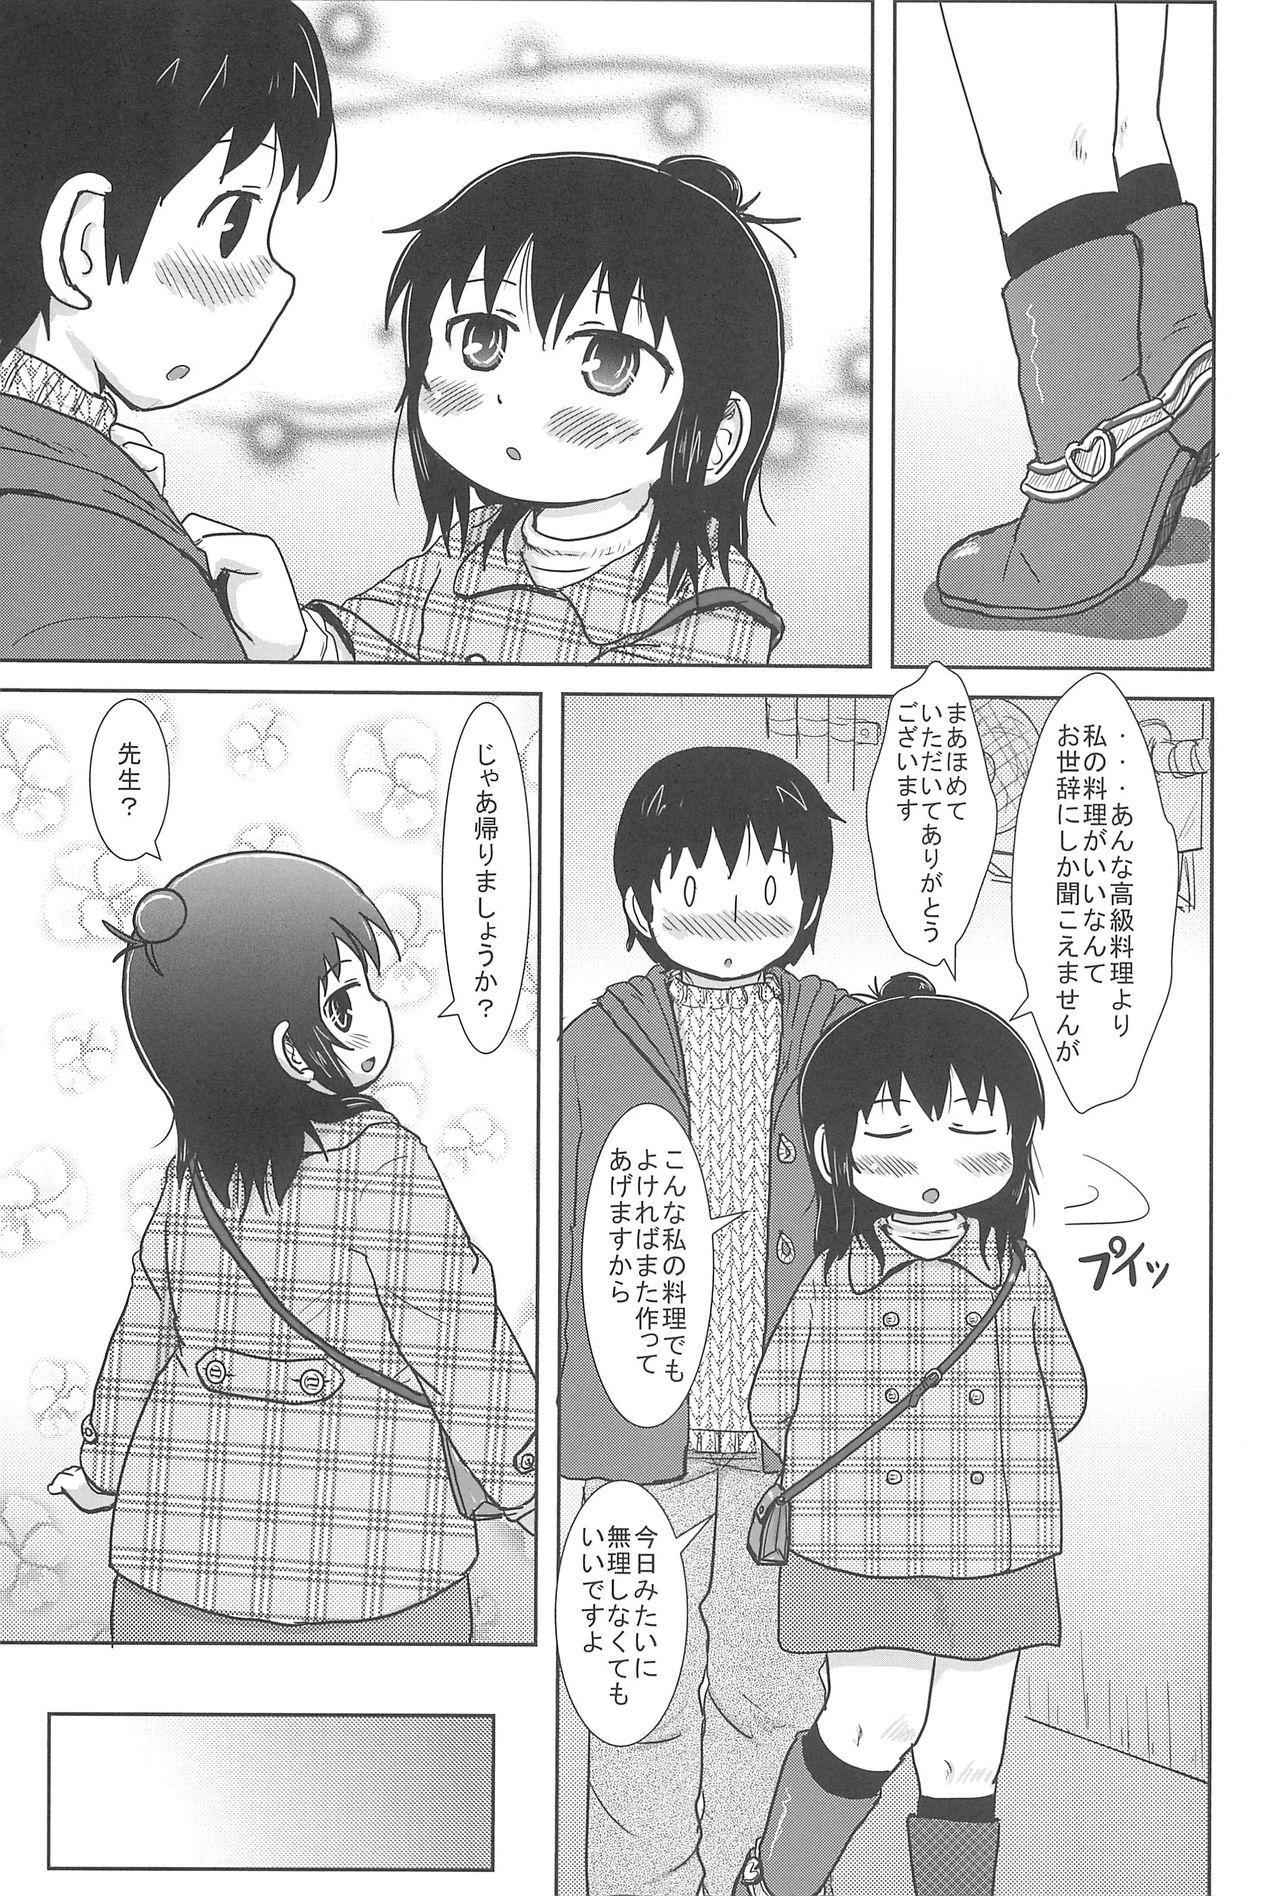 Futari de Oishiku 8